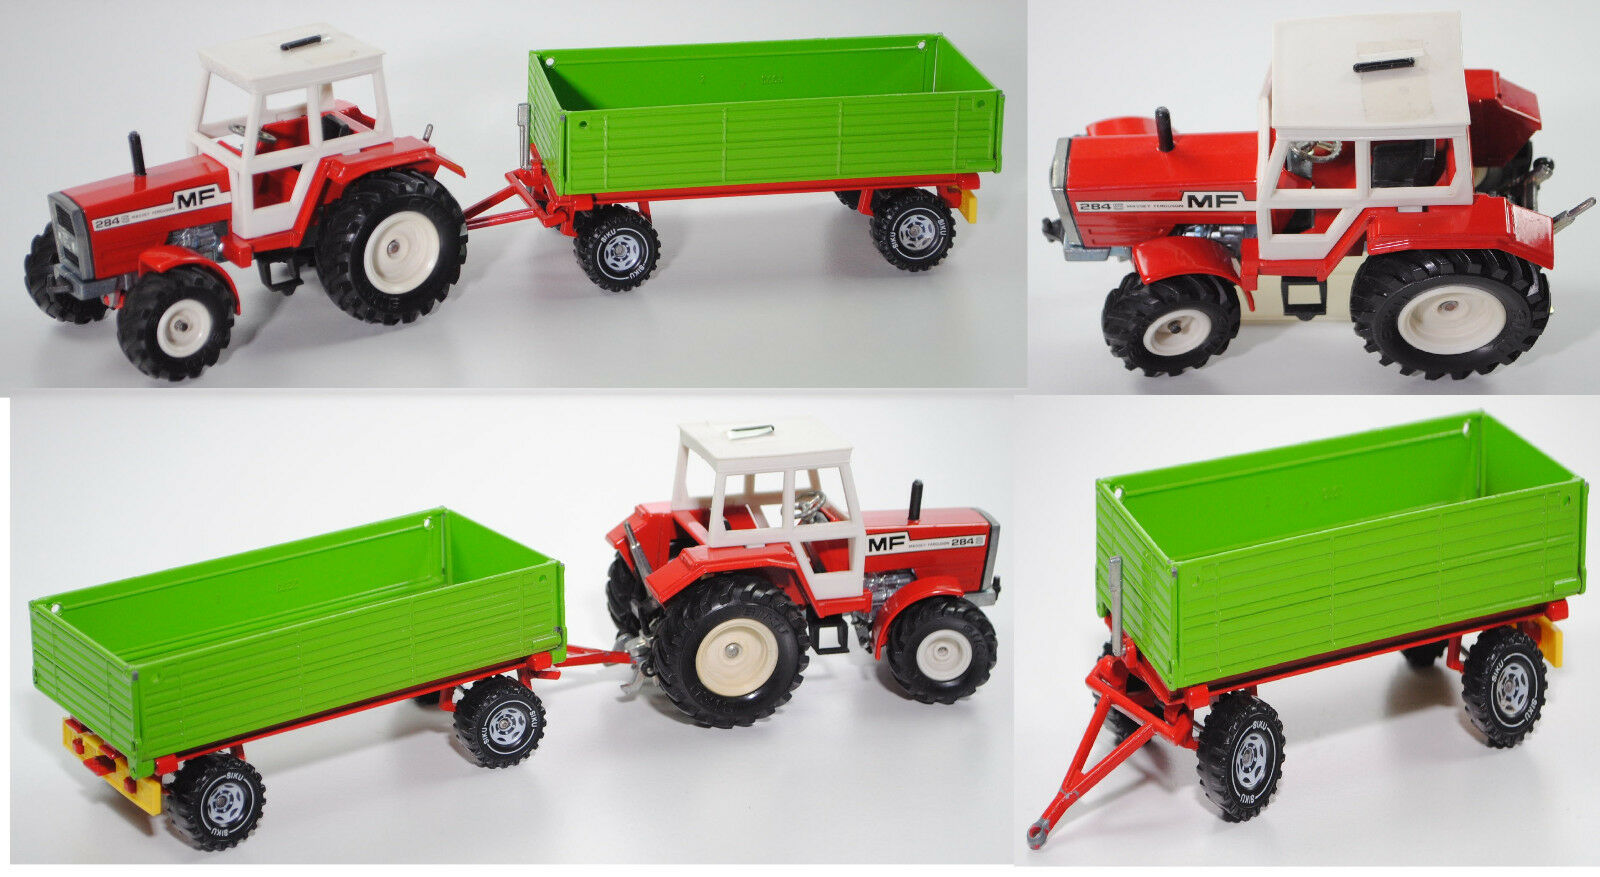 SIKU FARMER 3750 Massey Ferguson MF 284 S Tracteur avec zweiachs-remorque, 1 32